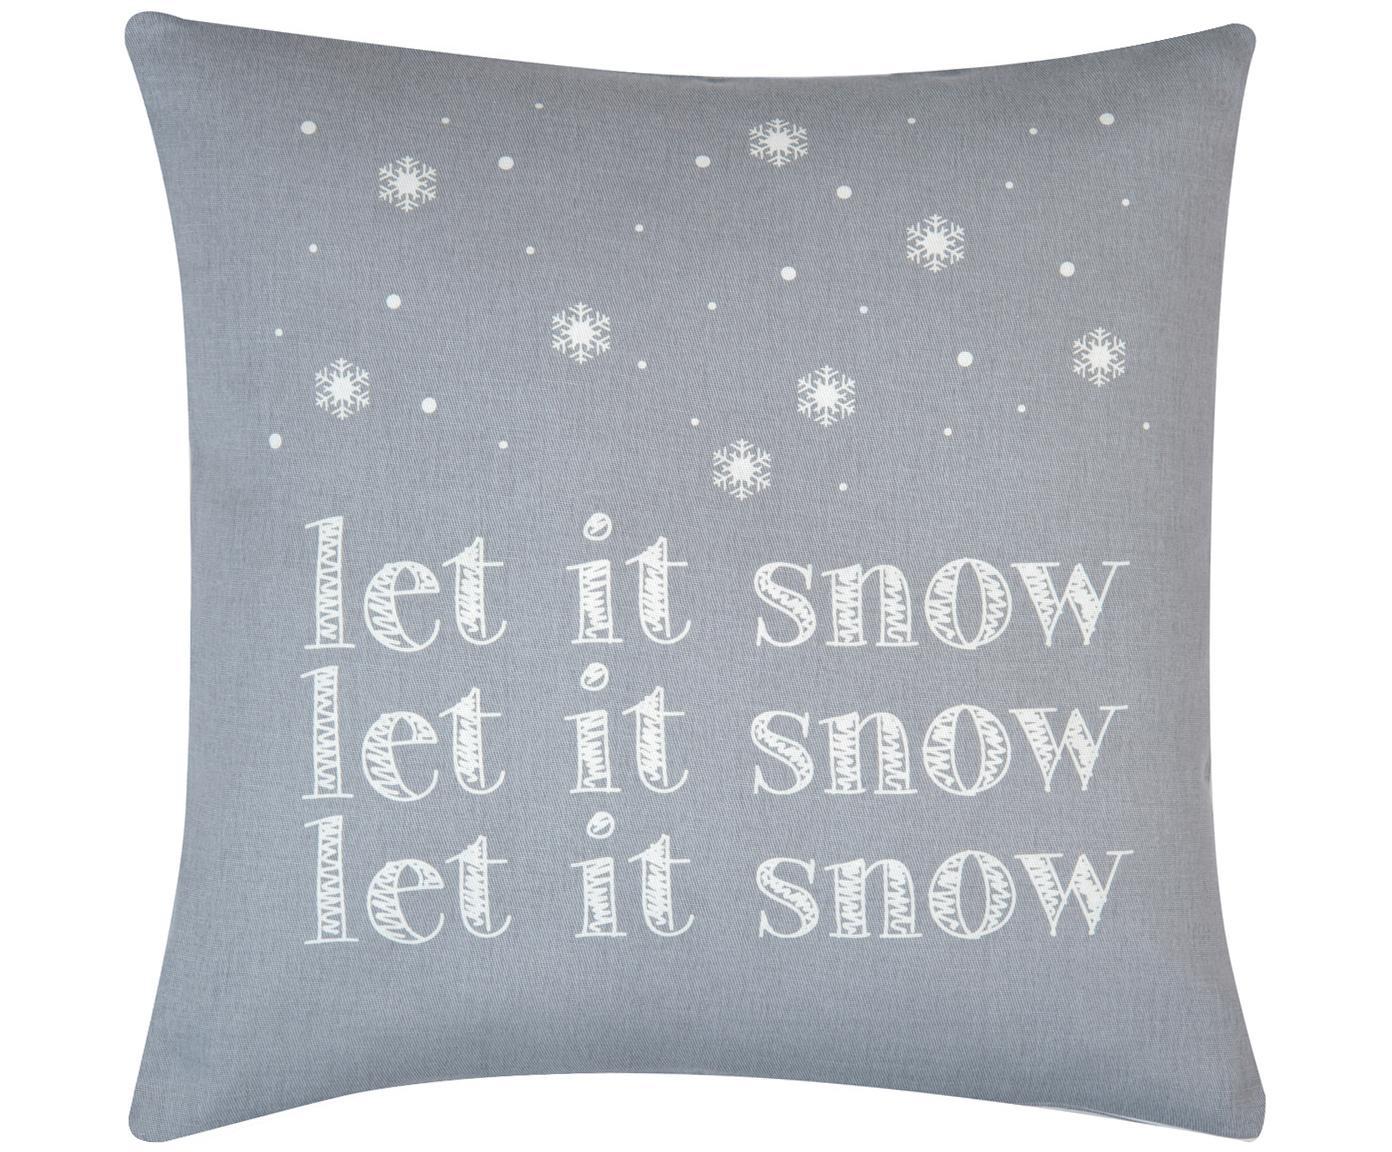 Kissenhülle Snow in Grau/Weiss mit Schriftzug, Baumwolle, Panamabindung, Grau,Ecru, 40 x 40 cm